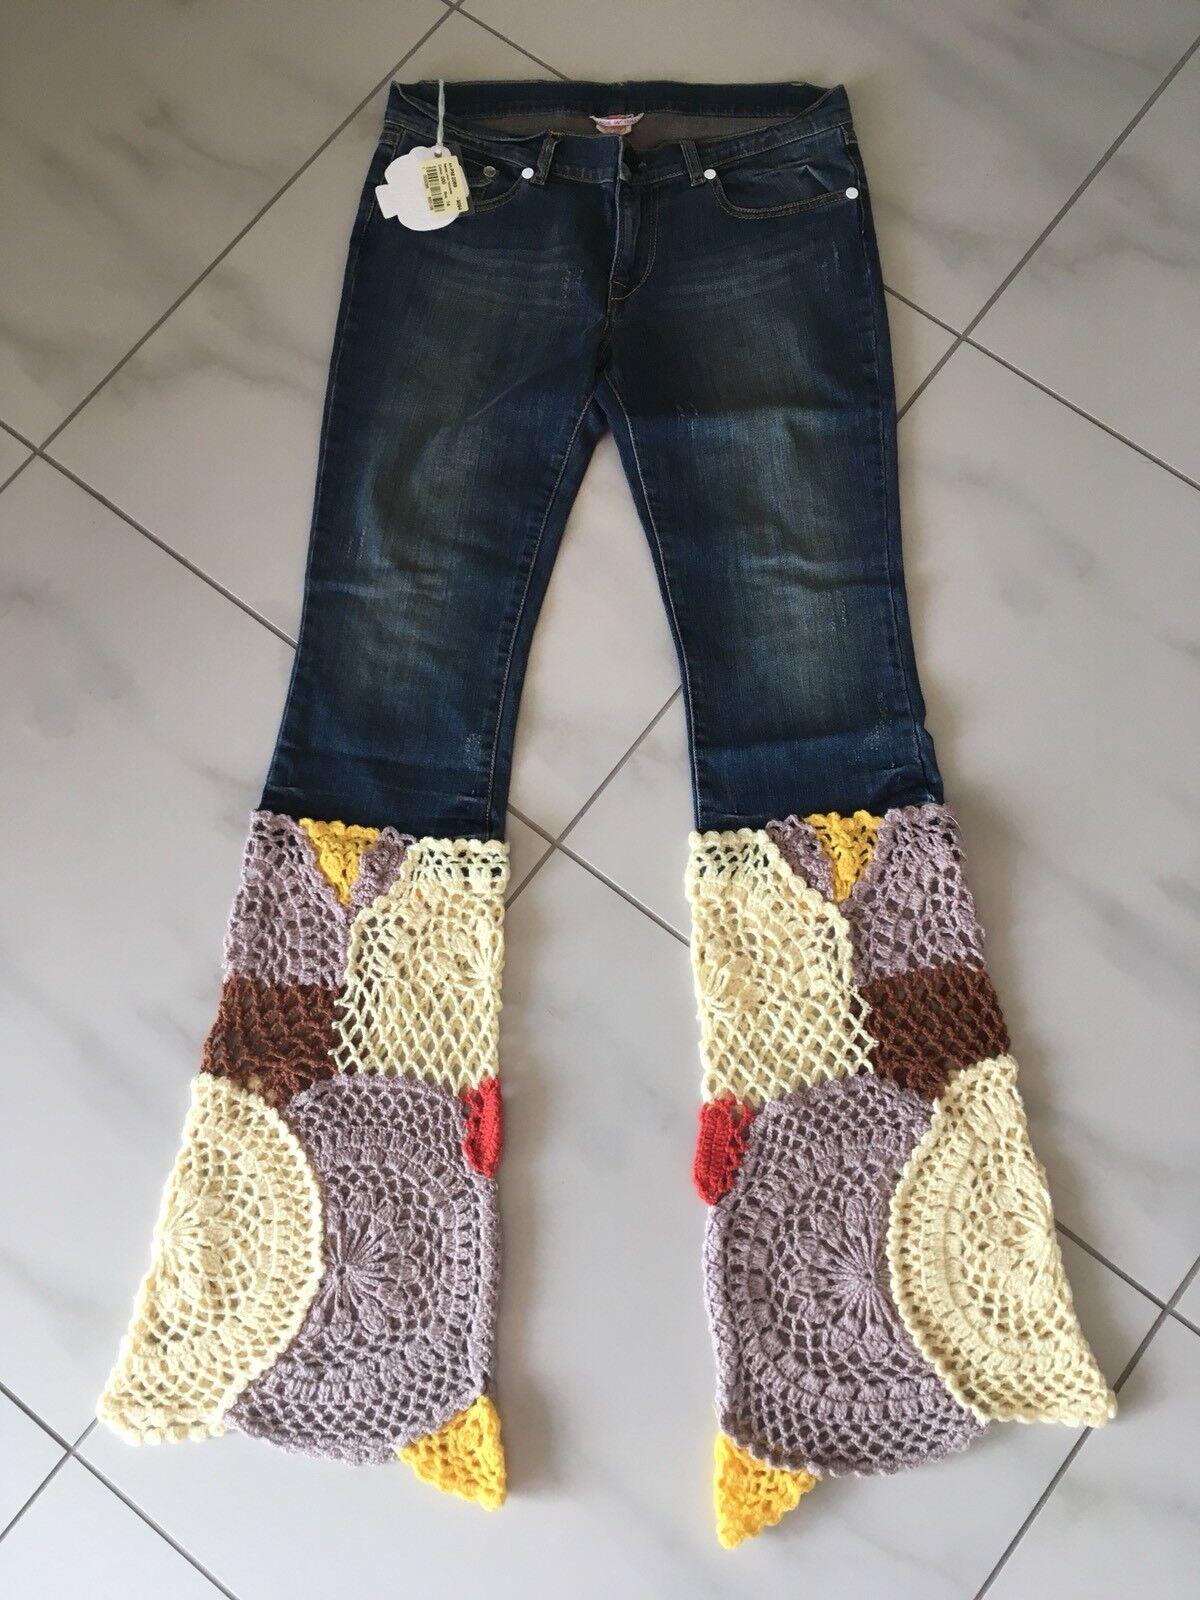 Nolita Pocket Jeans 14 Häkel Patchwork Blaumen Rar S 36 38 Sommer Hippie Style